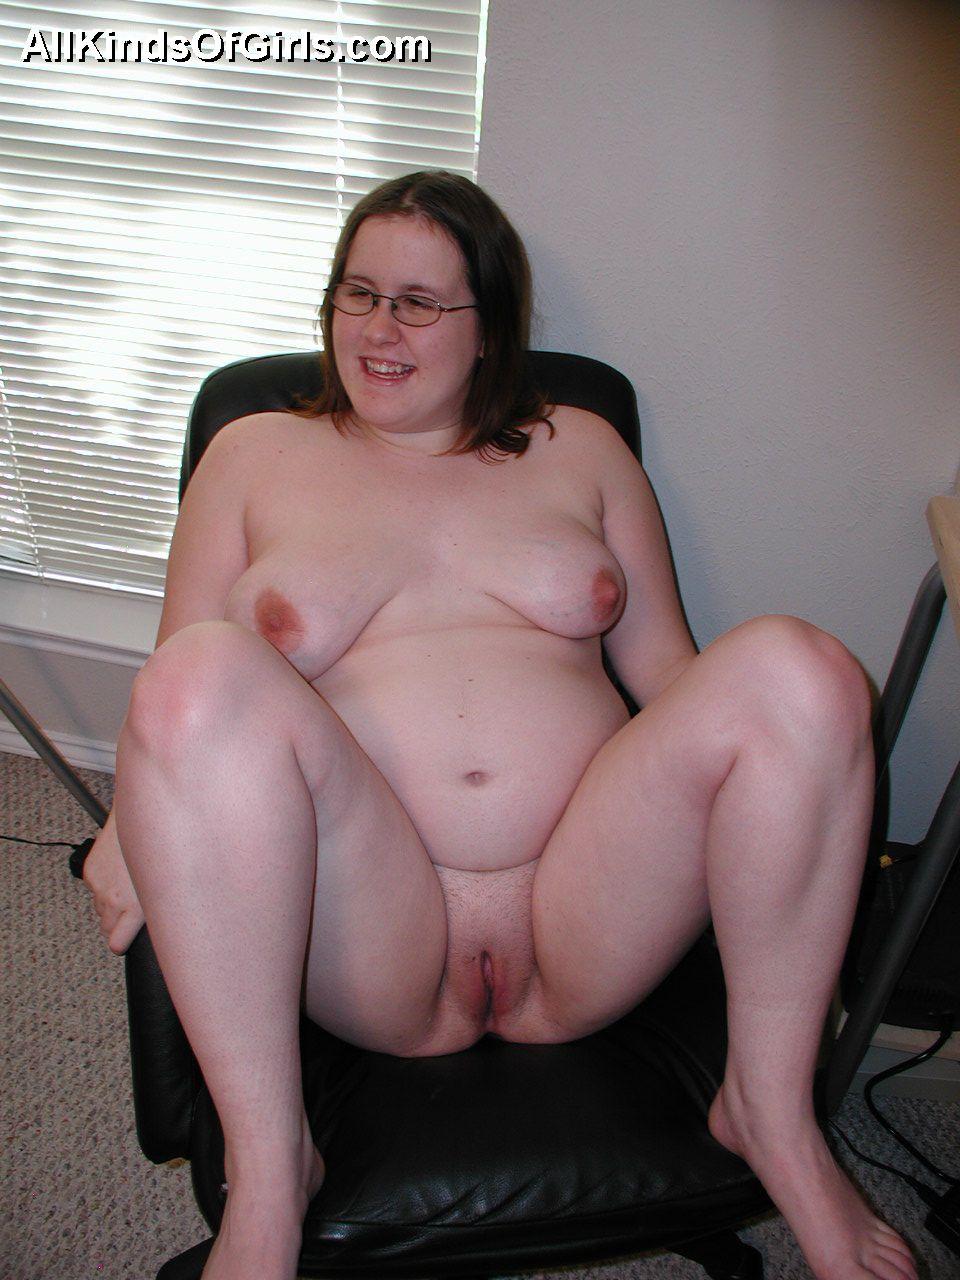 Chubby Teen Nude Gallery